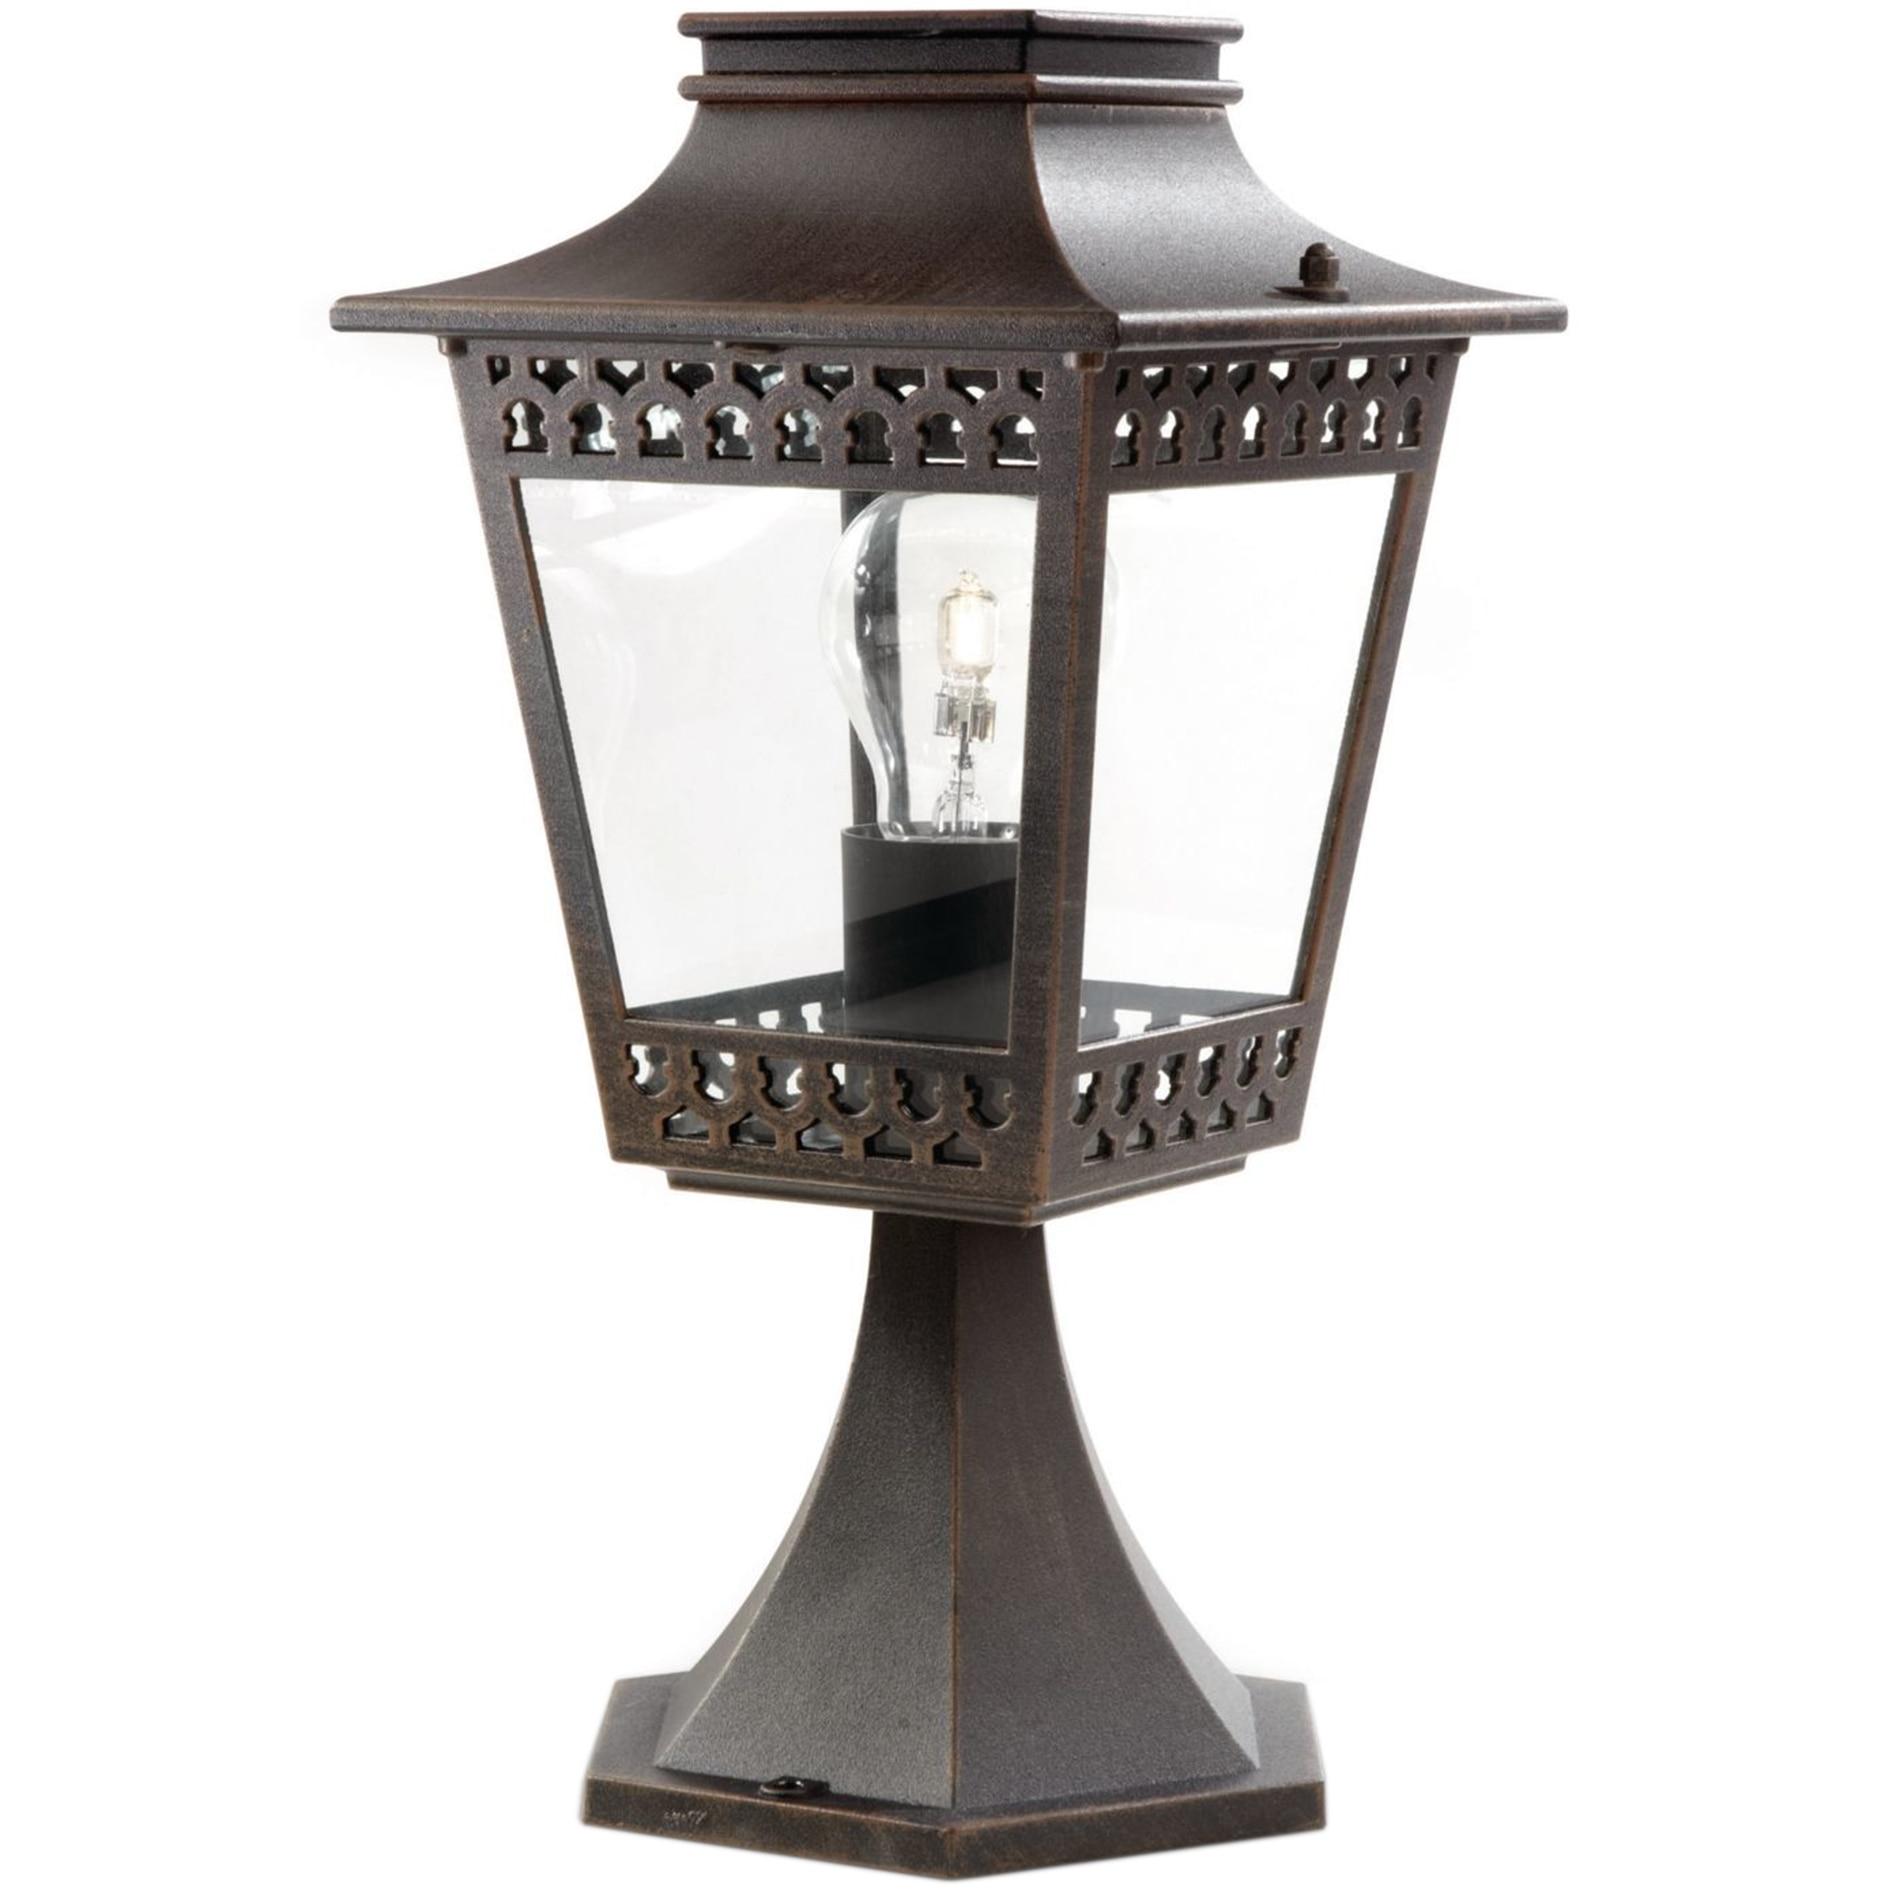 Fotografie Stalp iluminat exterior Philips myGarden Hedge, E27, 1x60W, IP44, 35 cm, Maro